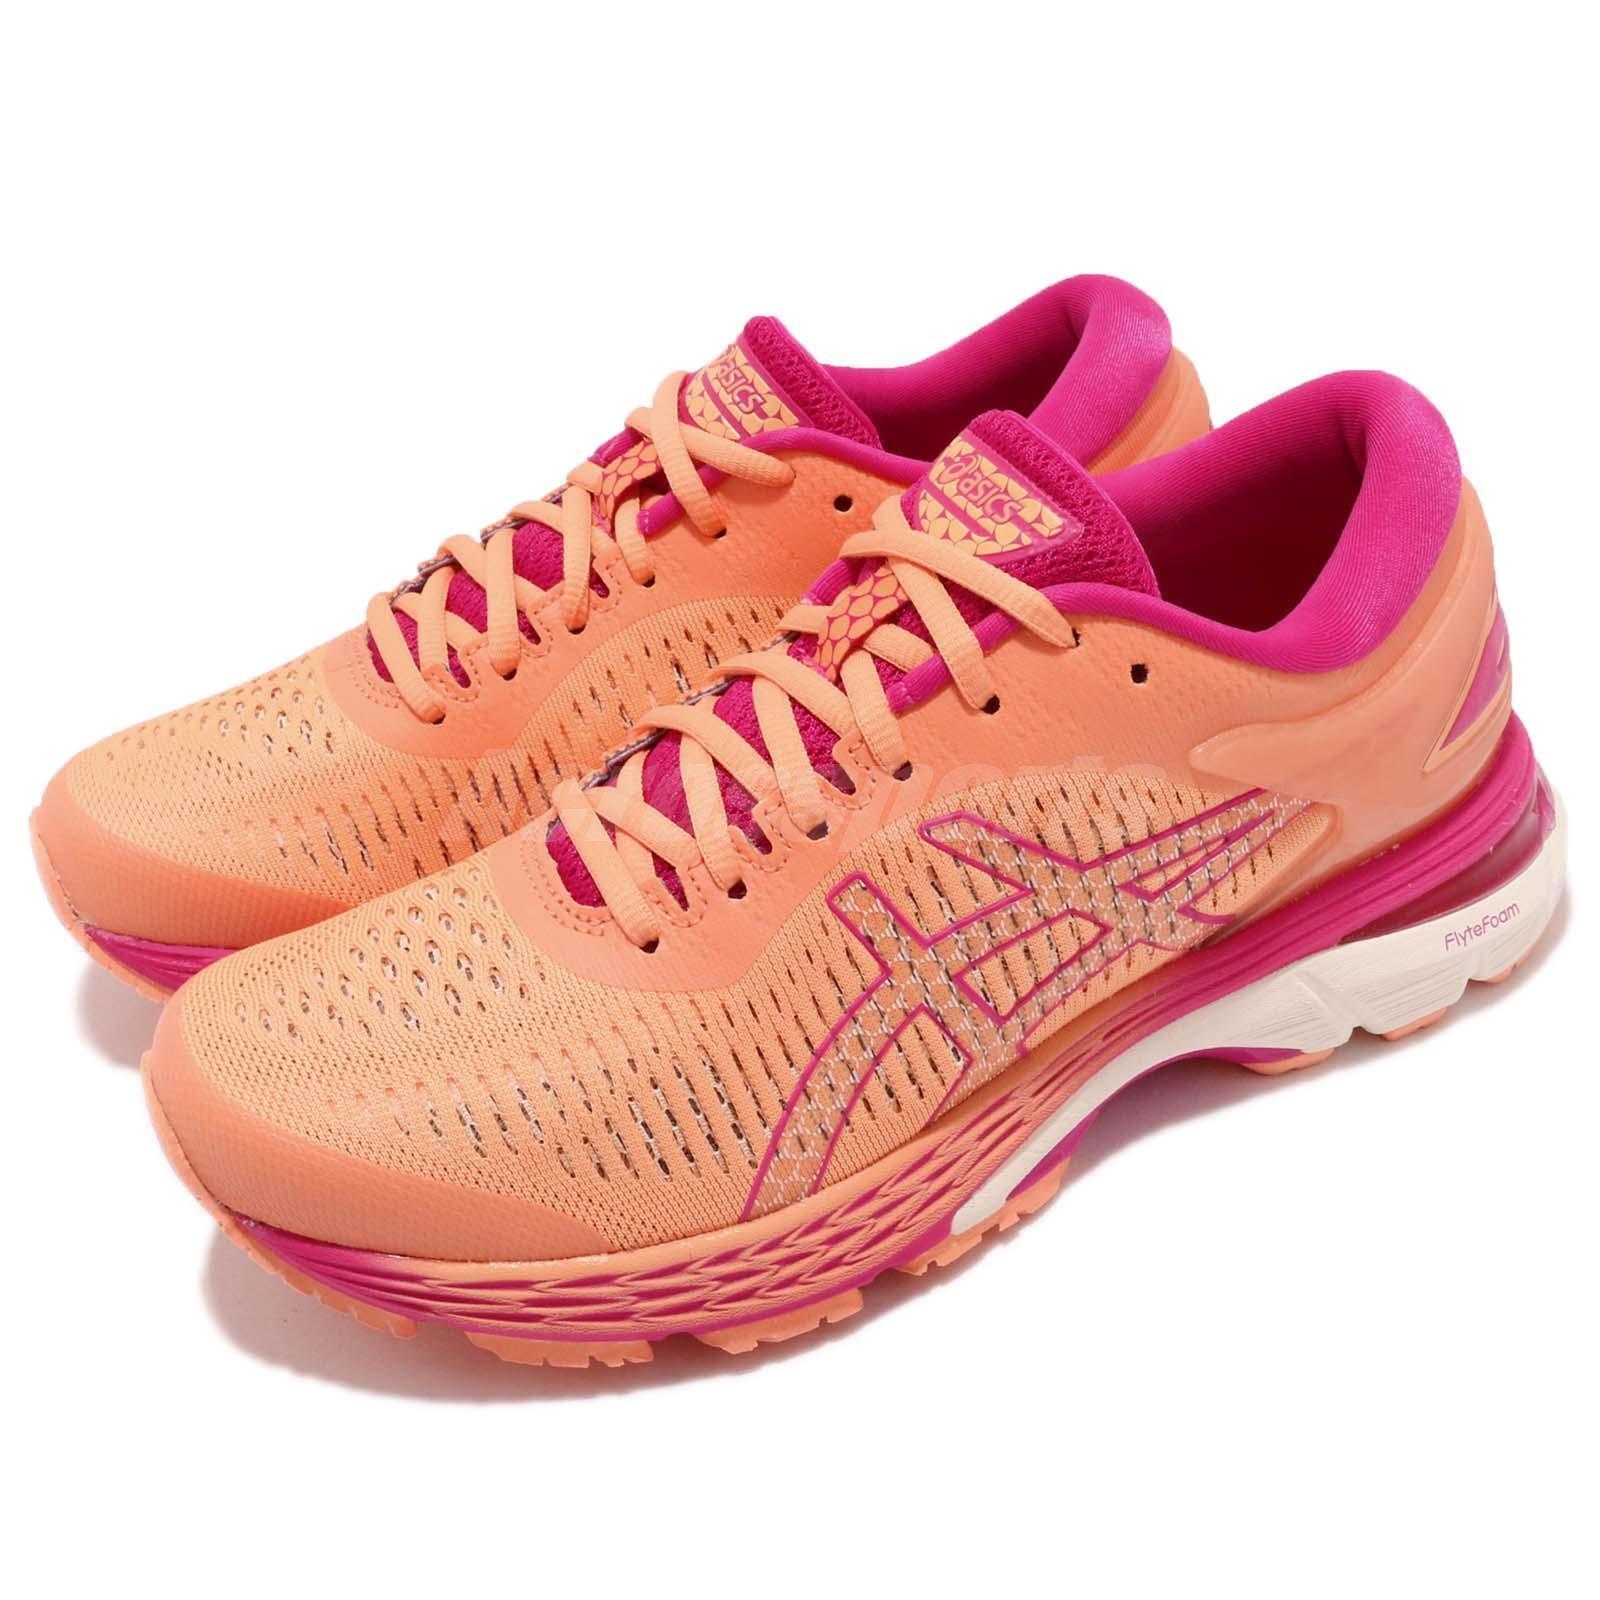 Asics Gel-Kayano 25 Orange Fuchsia Donna Running Shoes Runner 1012A02-6800